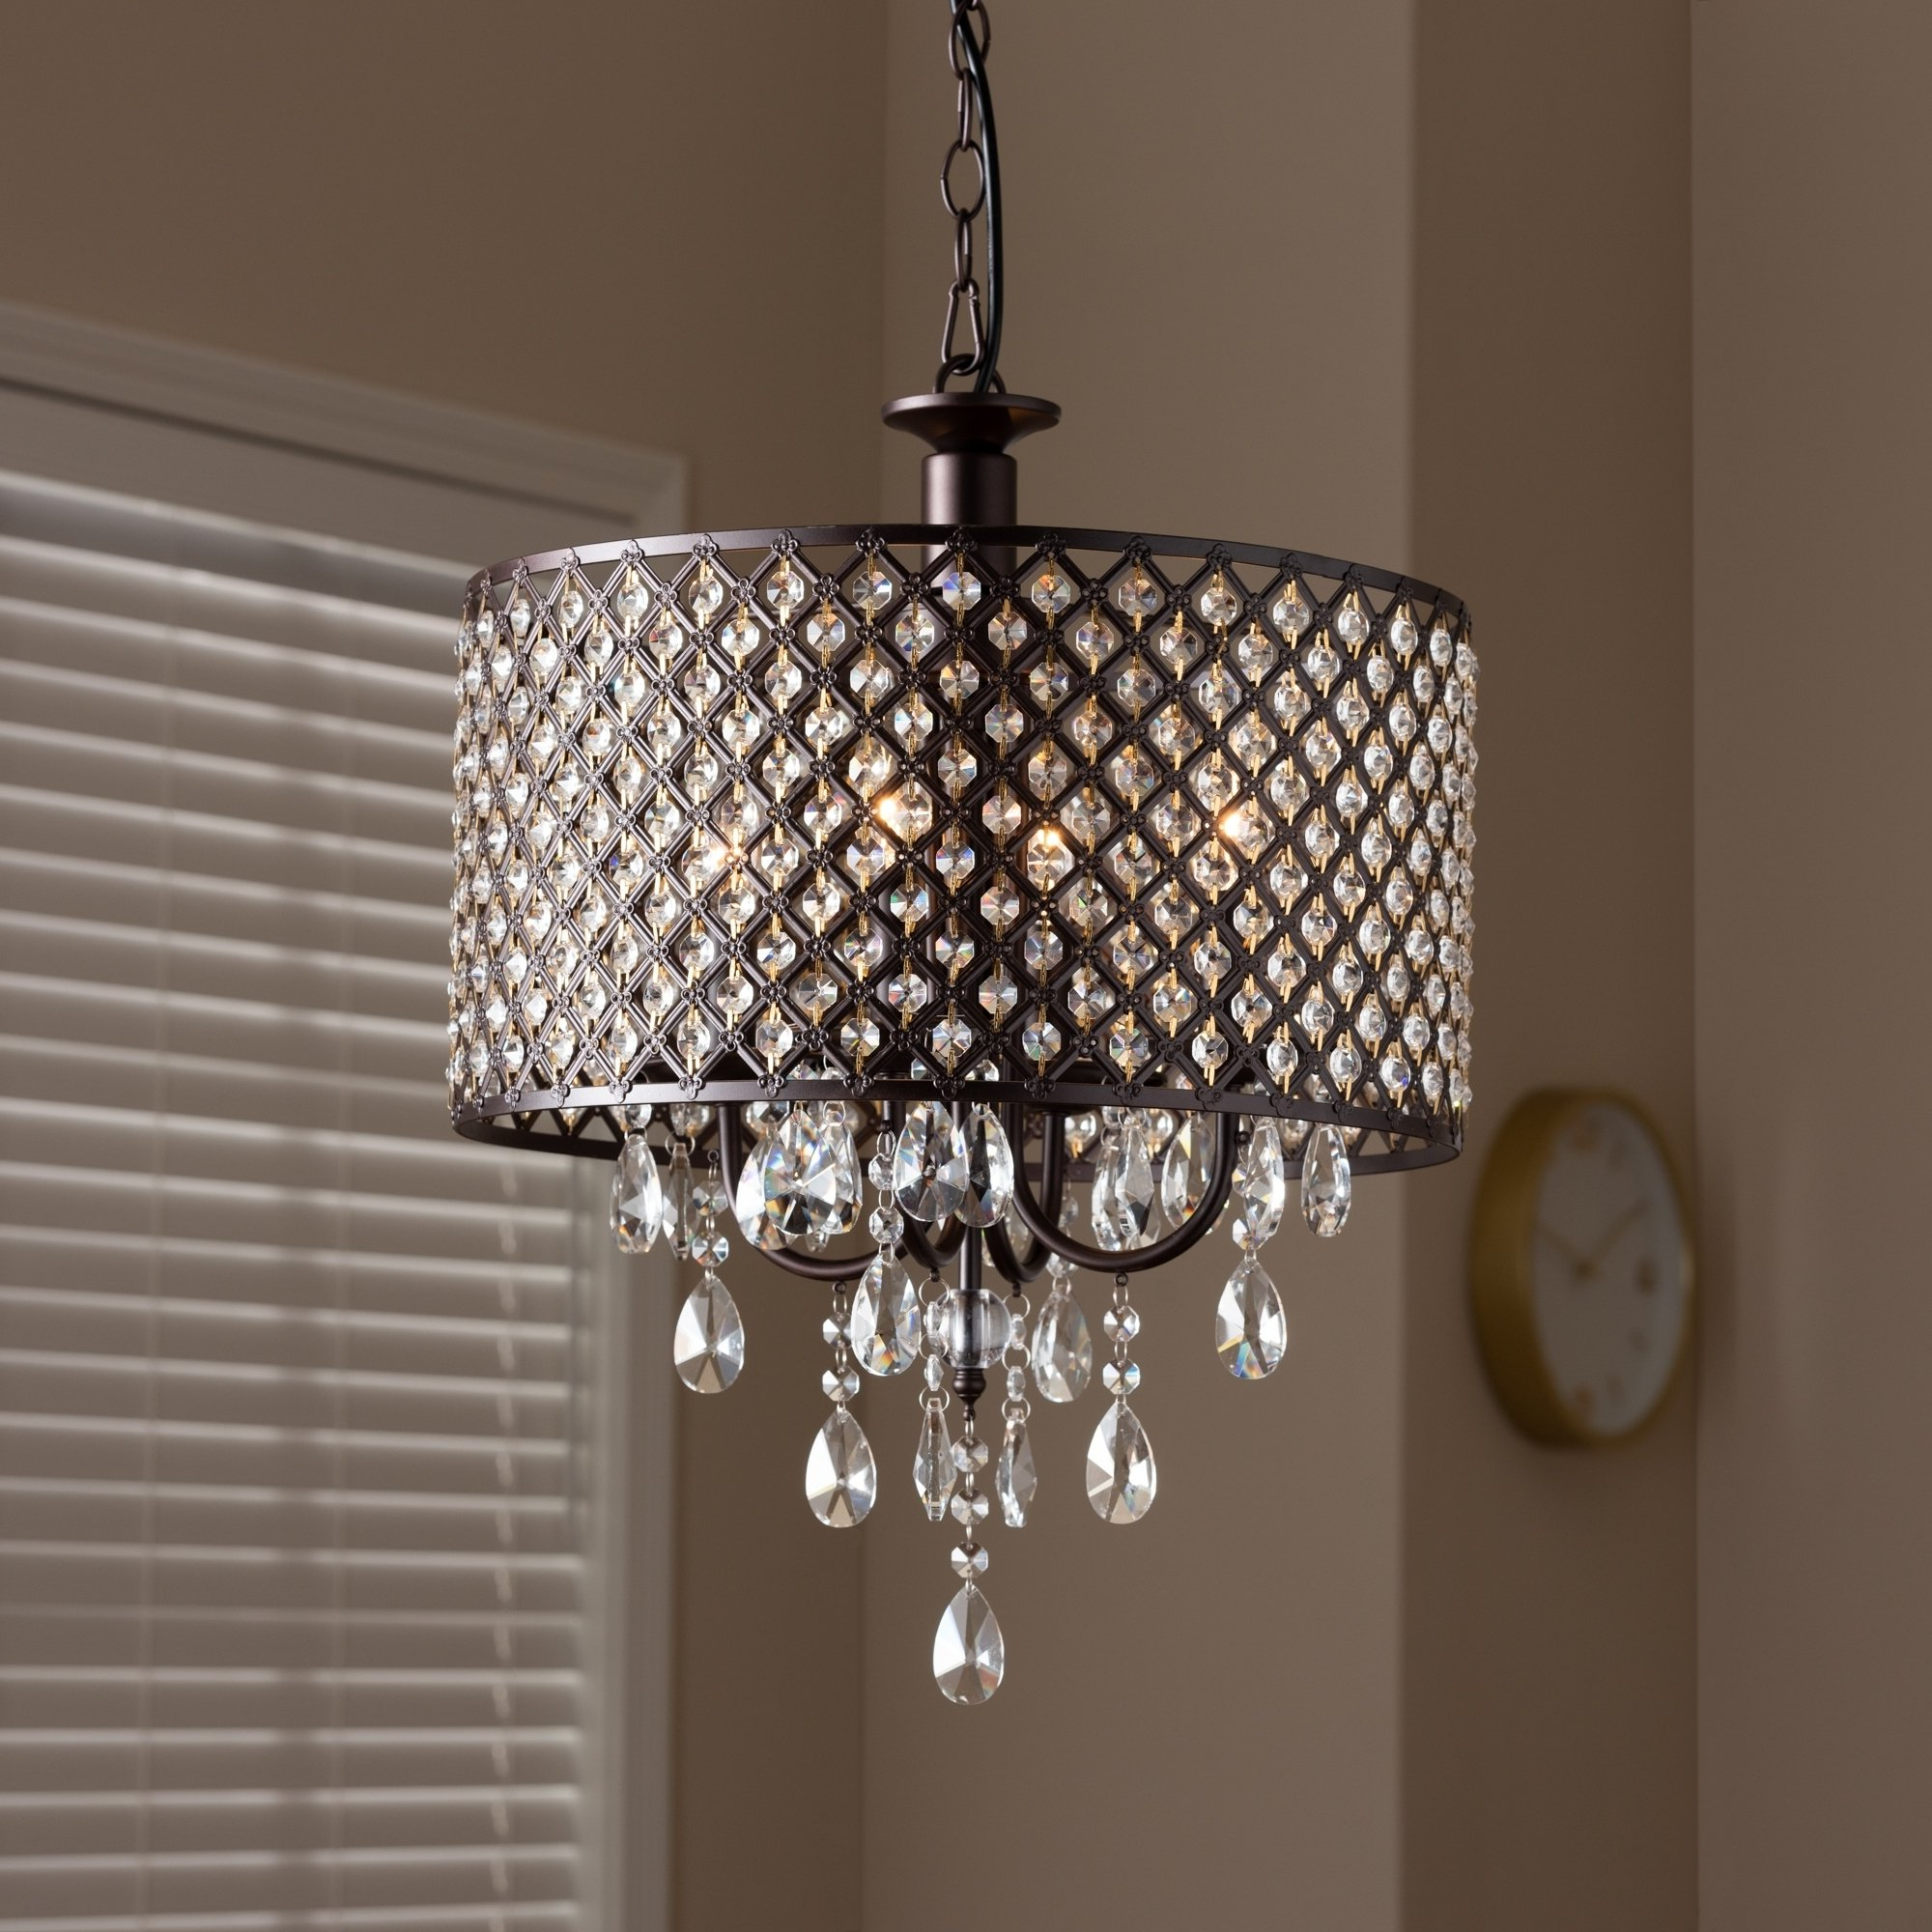 Aldgate 4 Light Crystal Chandeliers Throughout Popular Contemporary Dark Bronze 4 Light Drum Pendant Light (View 10 of 25)